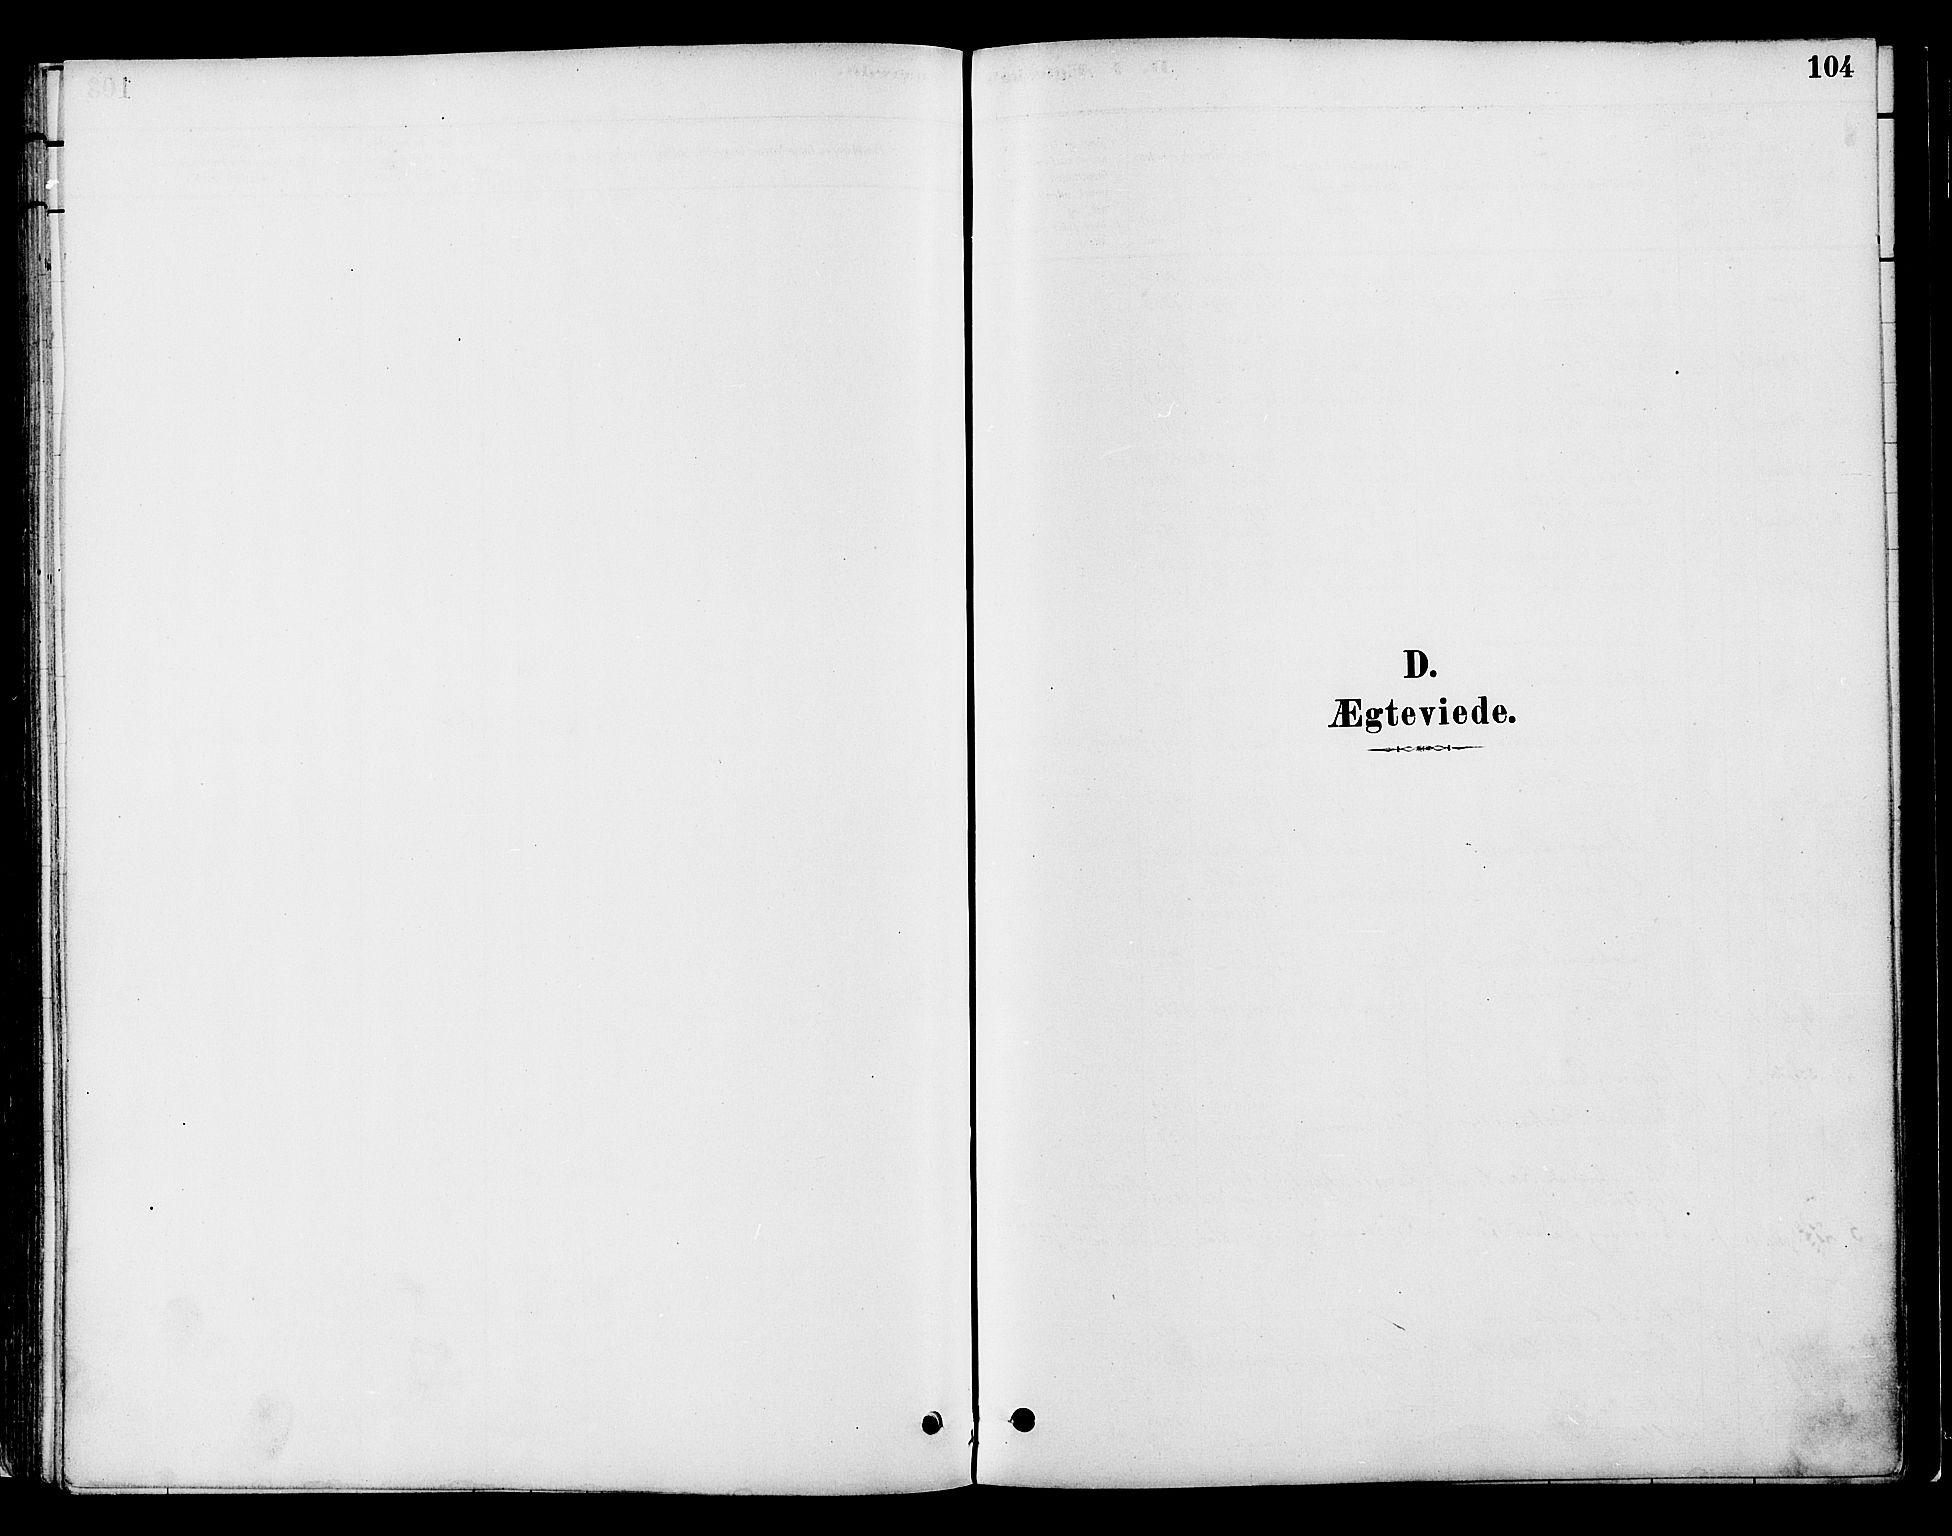 SAH, Gran prestekontor, Ministerialbok nr. 16, 1880-1888, s. 104